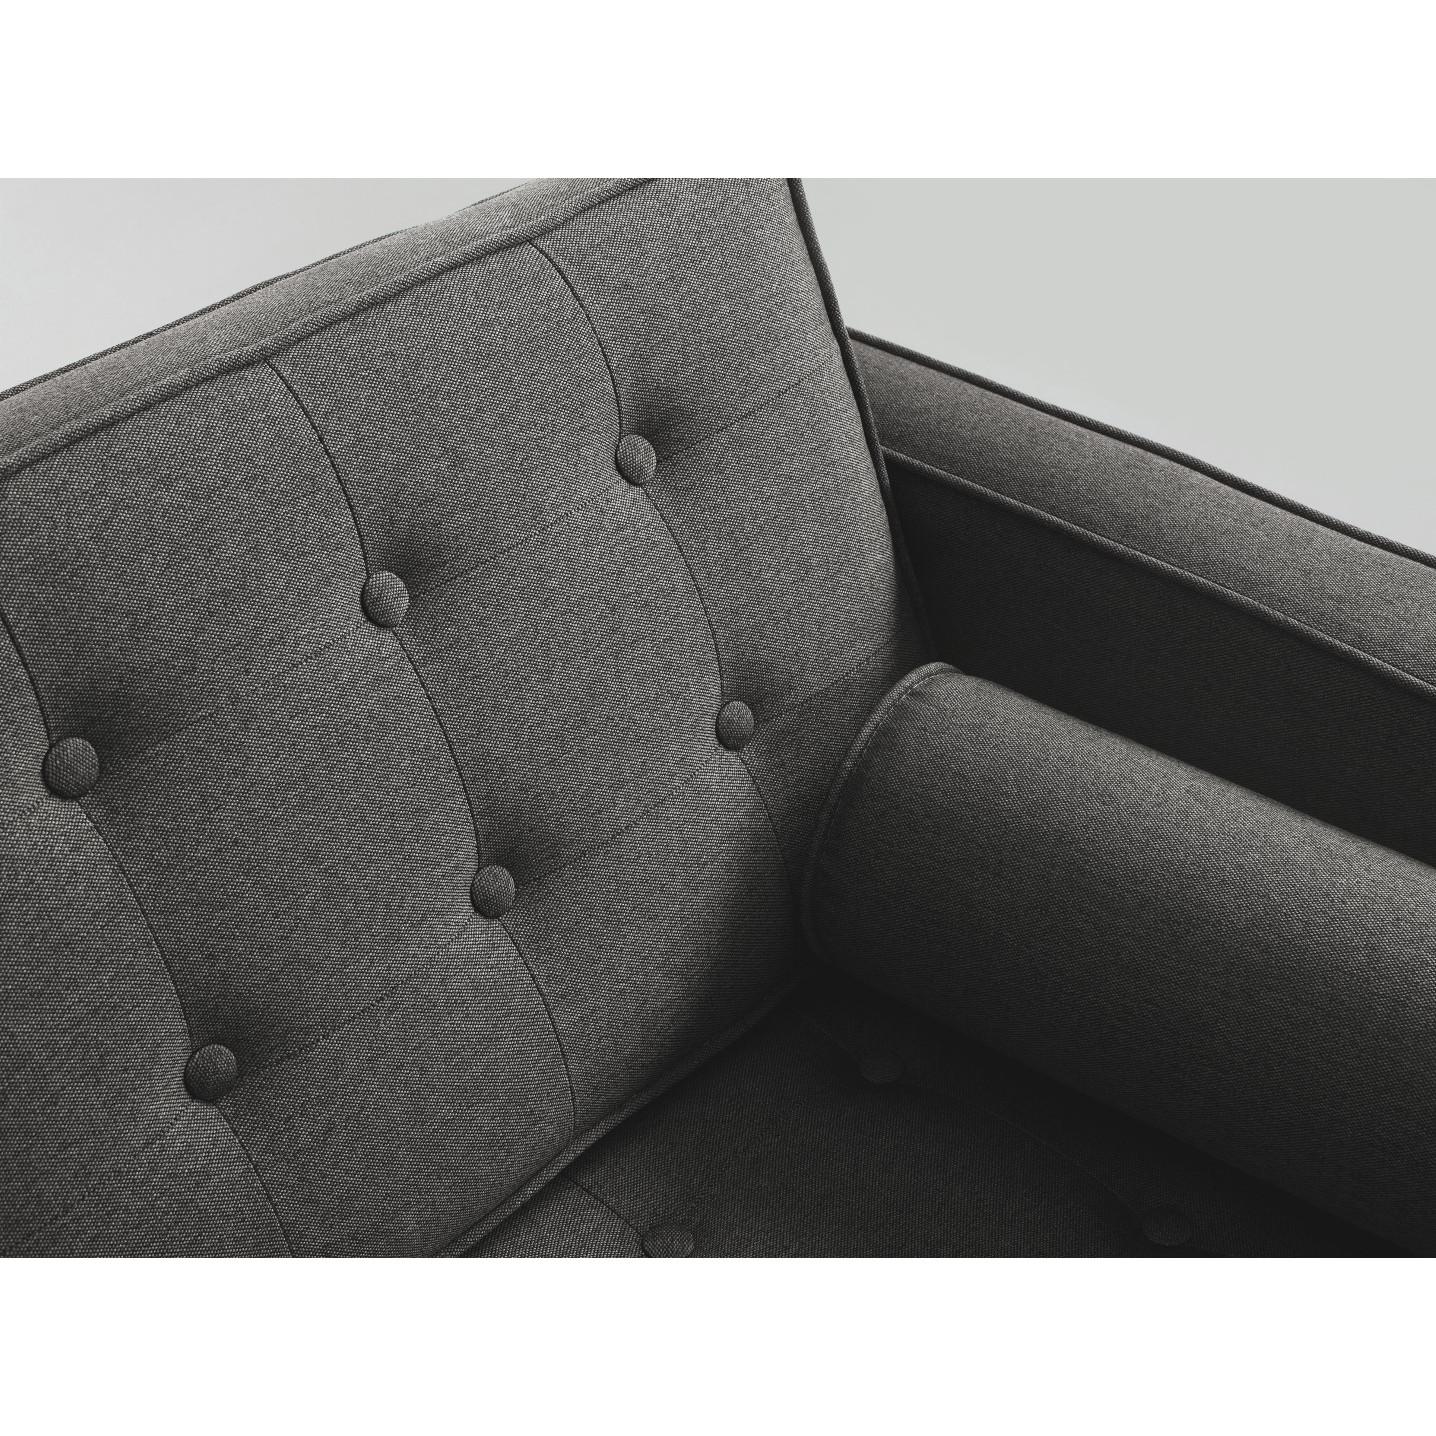 2 Seater Sofa Topic Wood   Steel